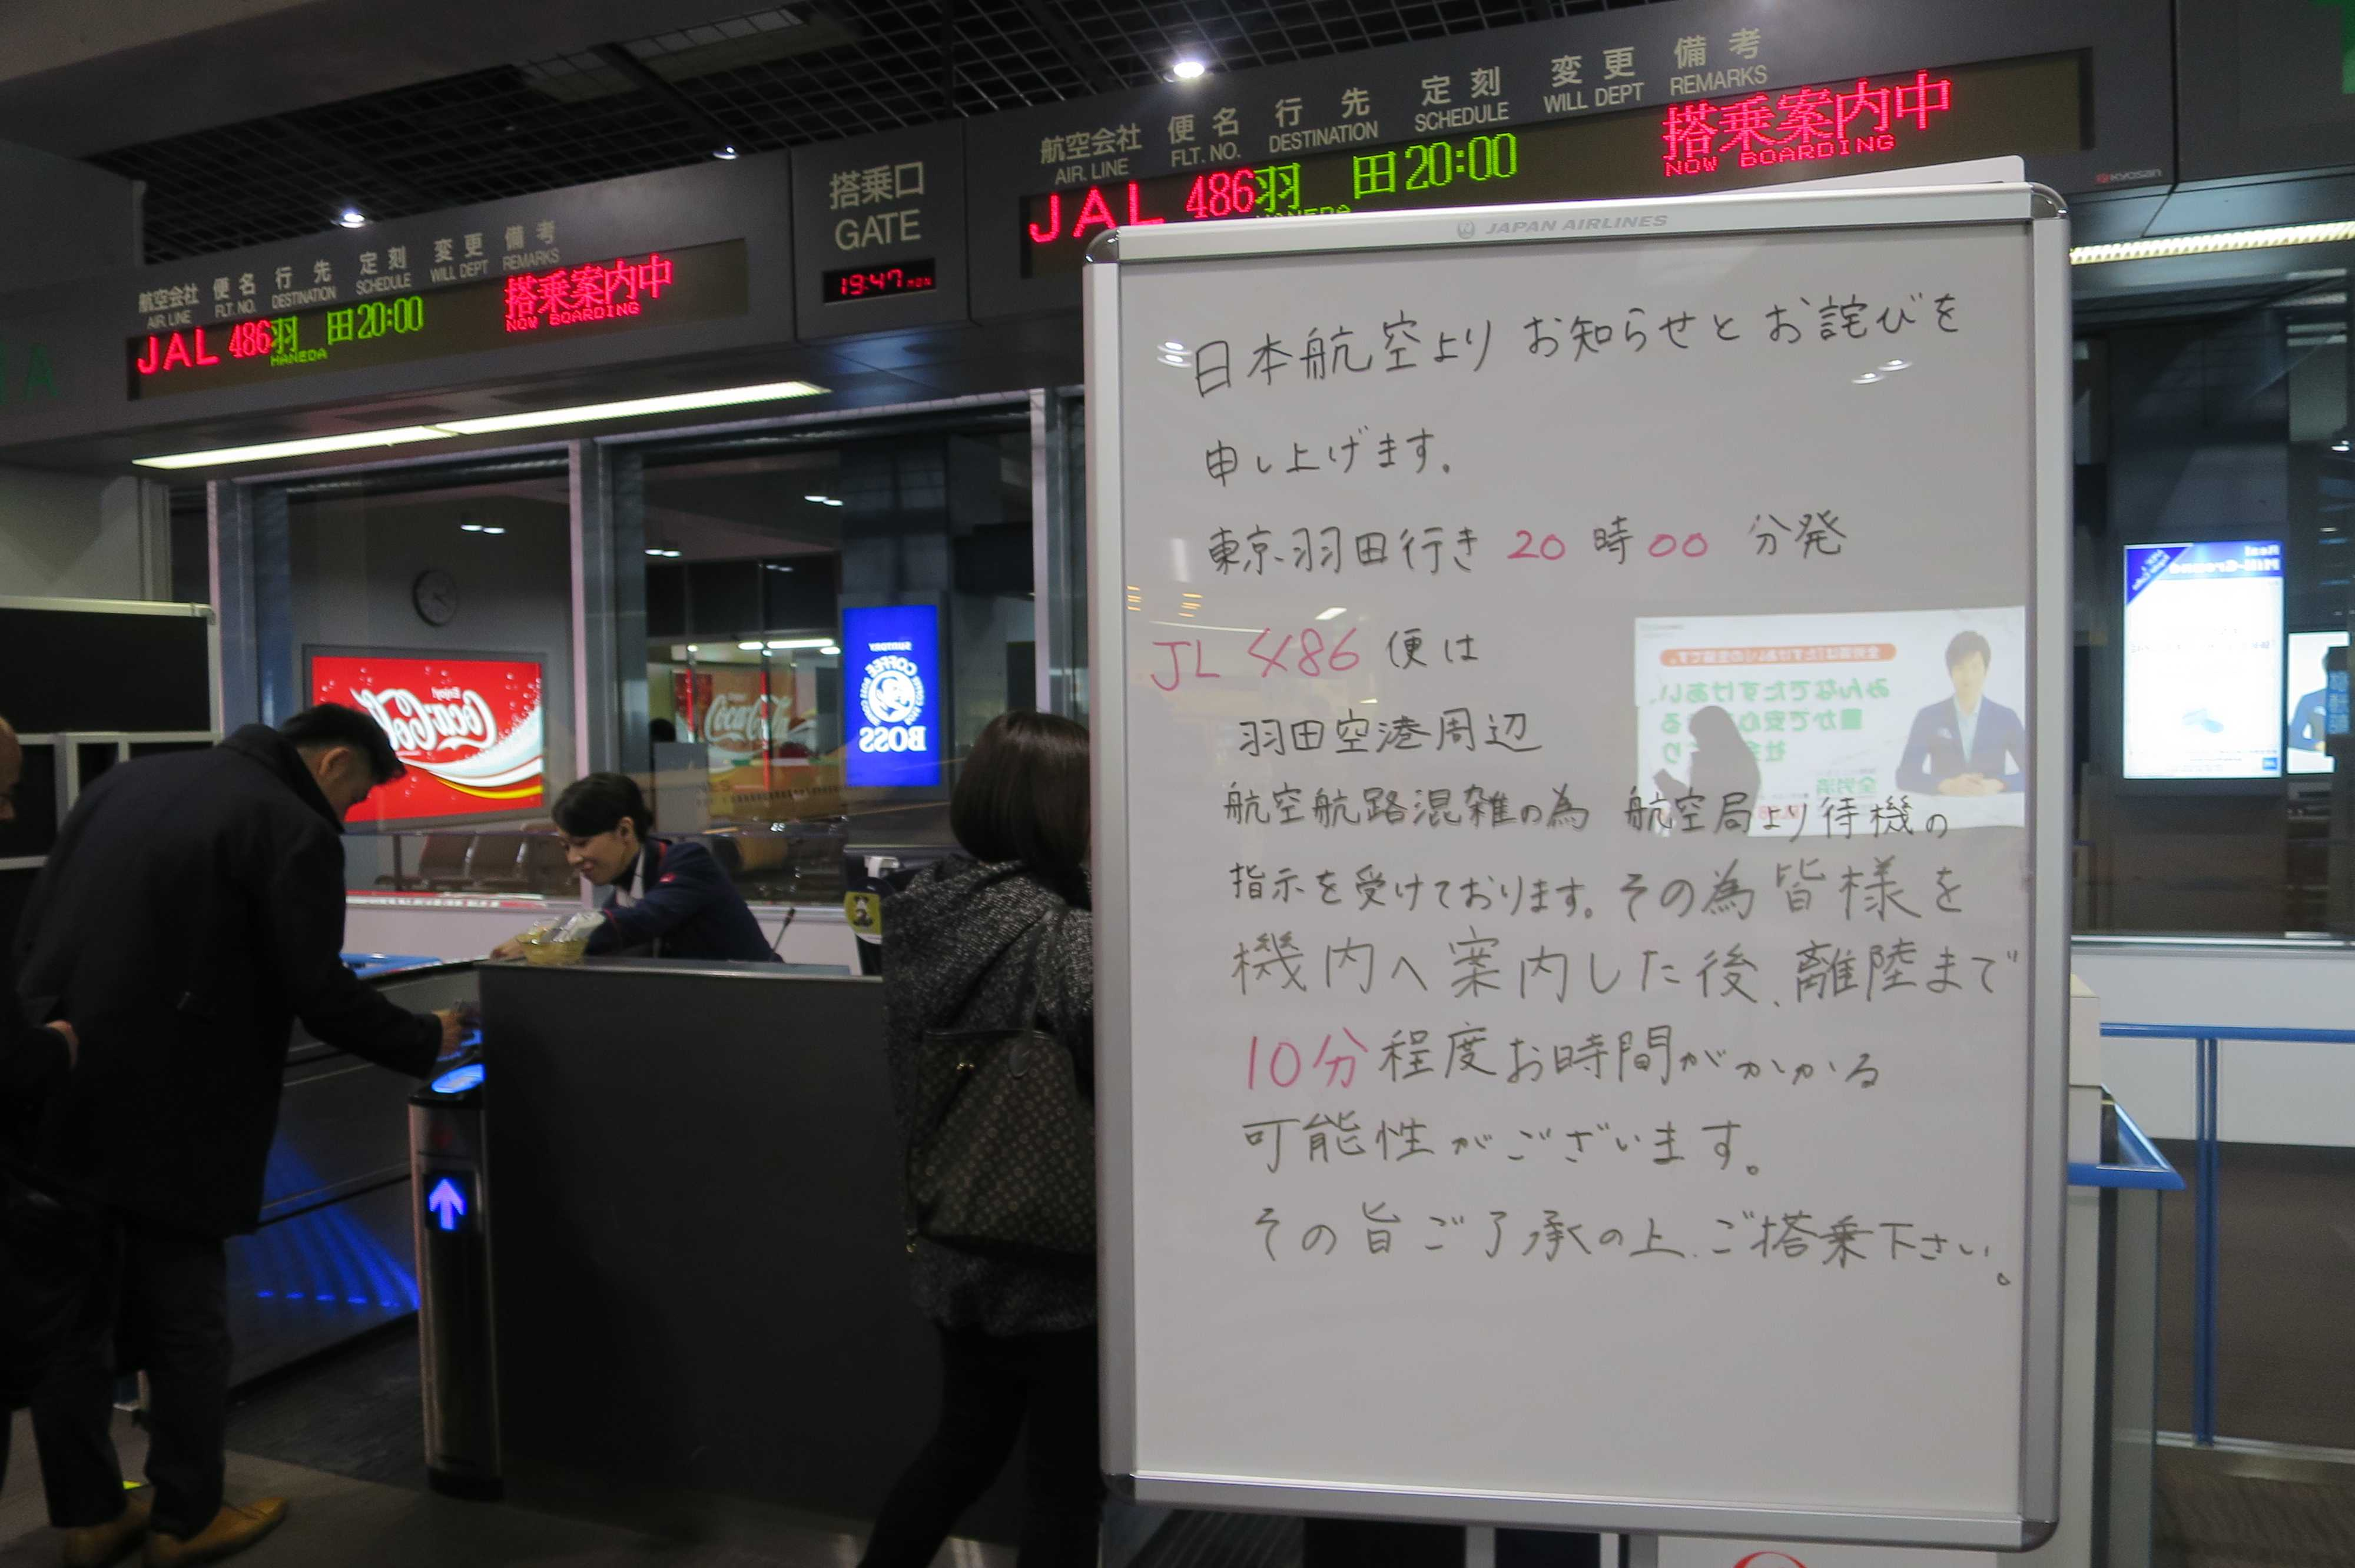 JL486便 羽田空港周辺の航空航路混雑のため、航空局より待機の指示